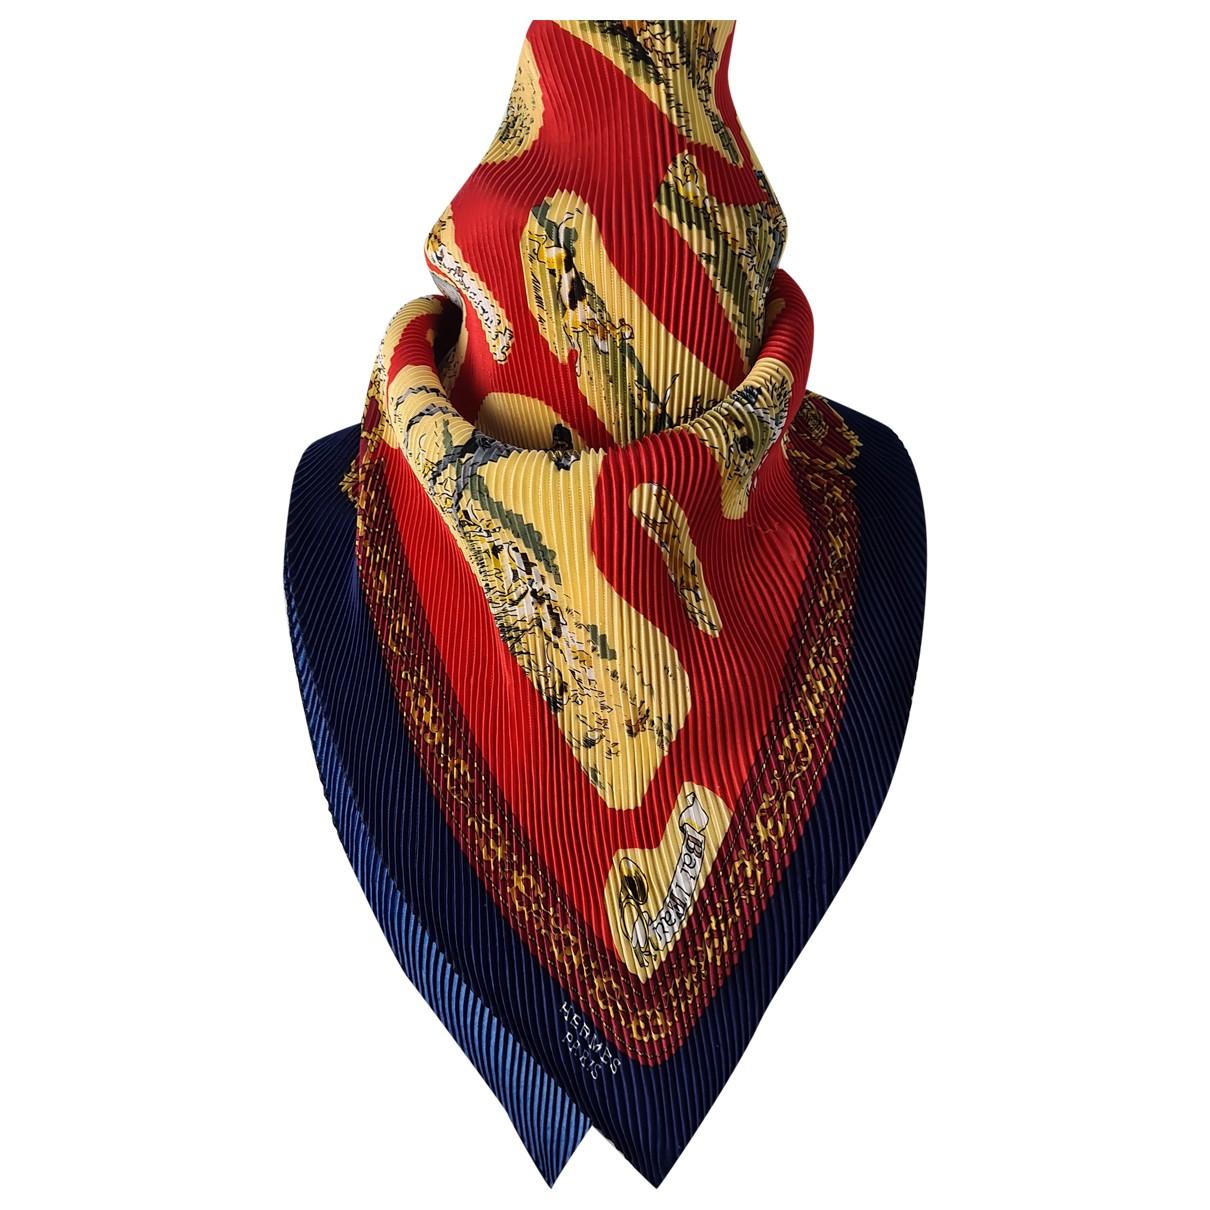 Carre Plisse en Viscosa Multicolor Hermes